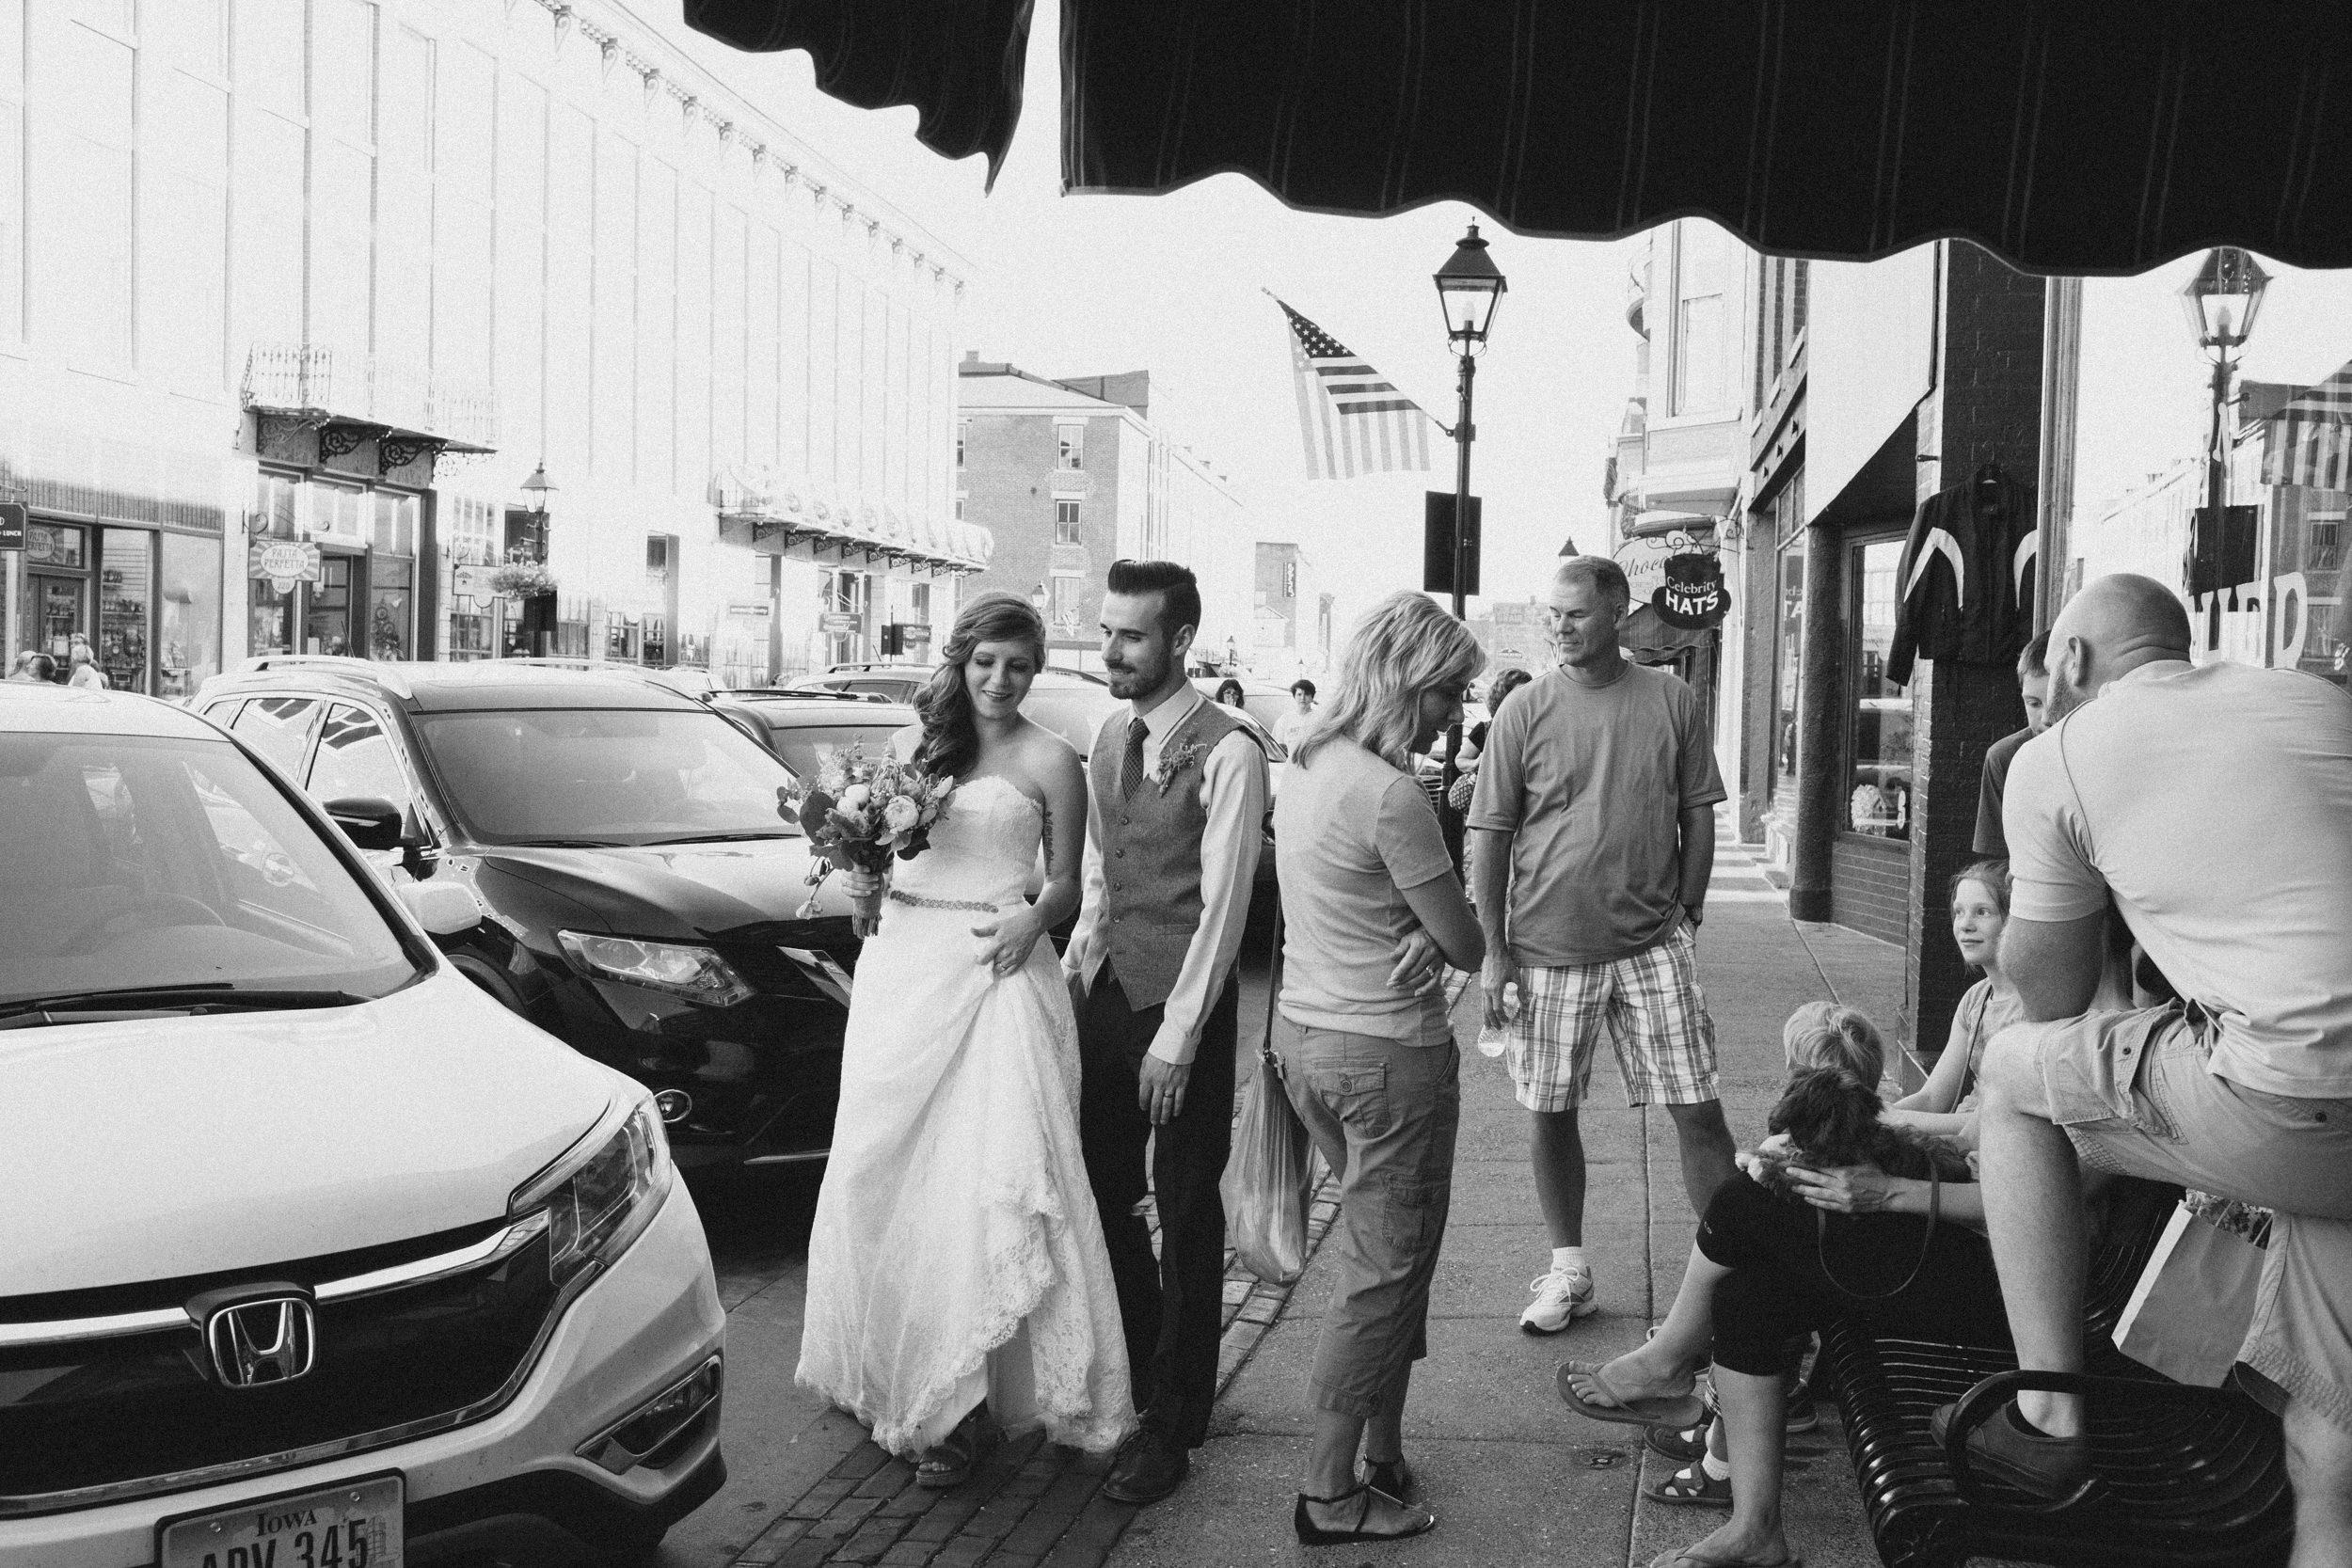 7-25-2015 Sarah and Jimmy's Eagle Ridge Downtown Galena Wedding-174.jpg